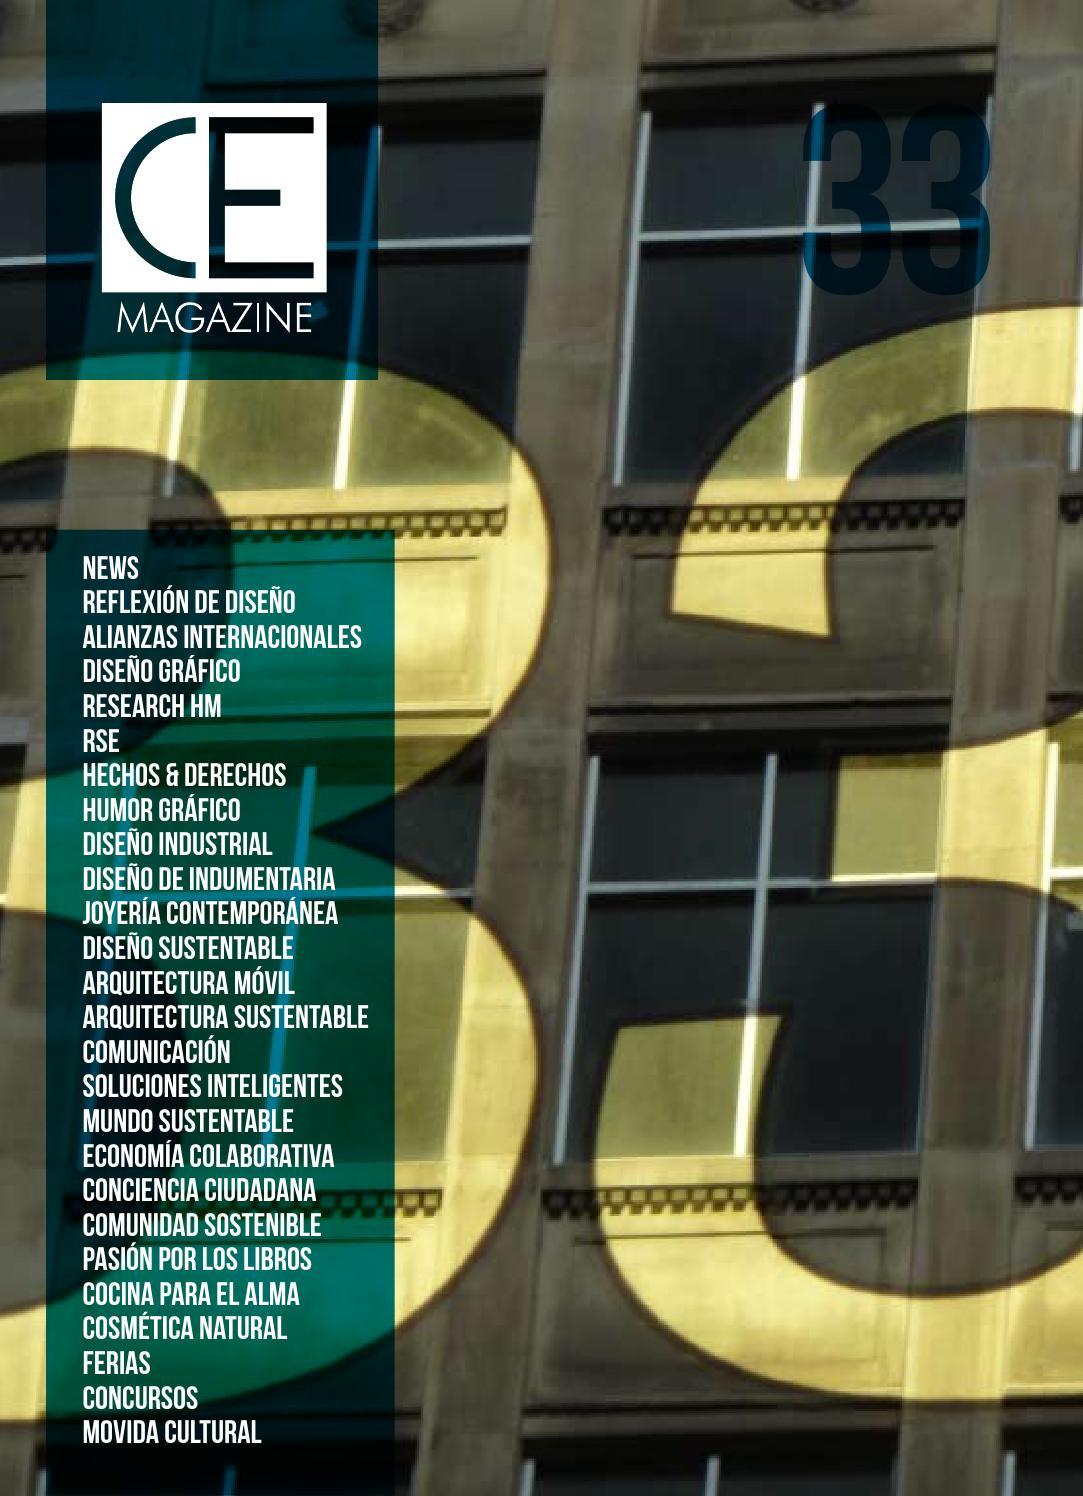 CEmagazine # 33 año 2016 by Creatividad Etica - issuu